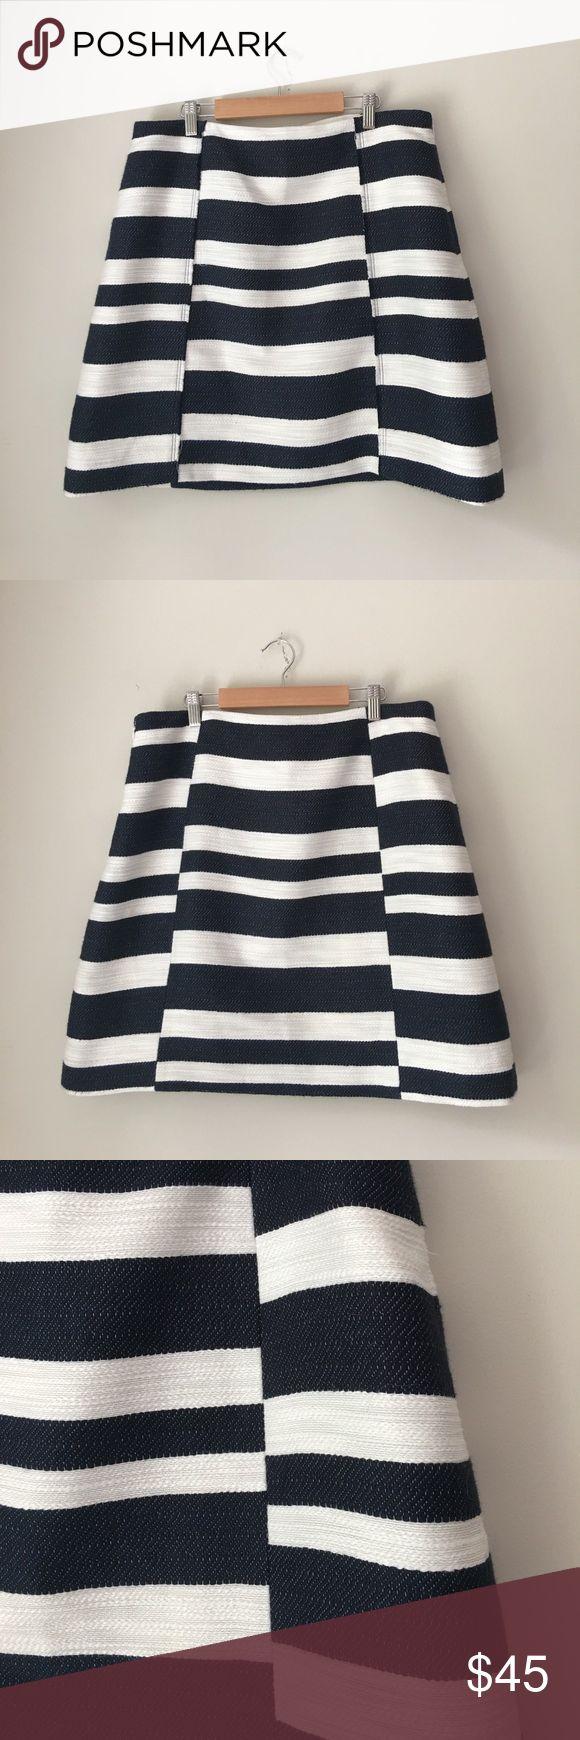 LOFT Navy Striped Cotton A-Line Skirt Gorgeous navy striped a-line skirt by LOFT. Side zip. Size 12. NWOT. LOFT Skirts A-Line or Full